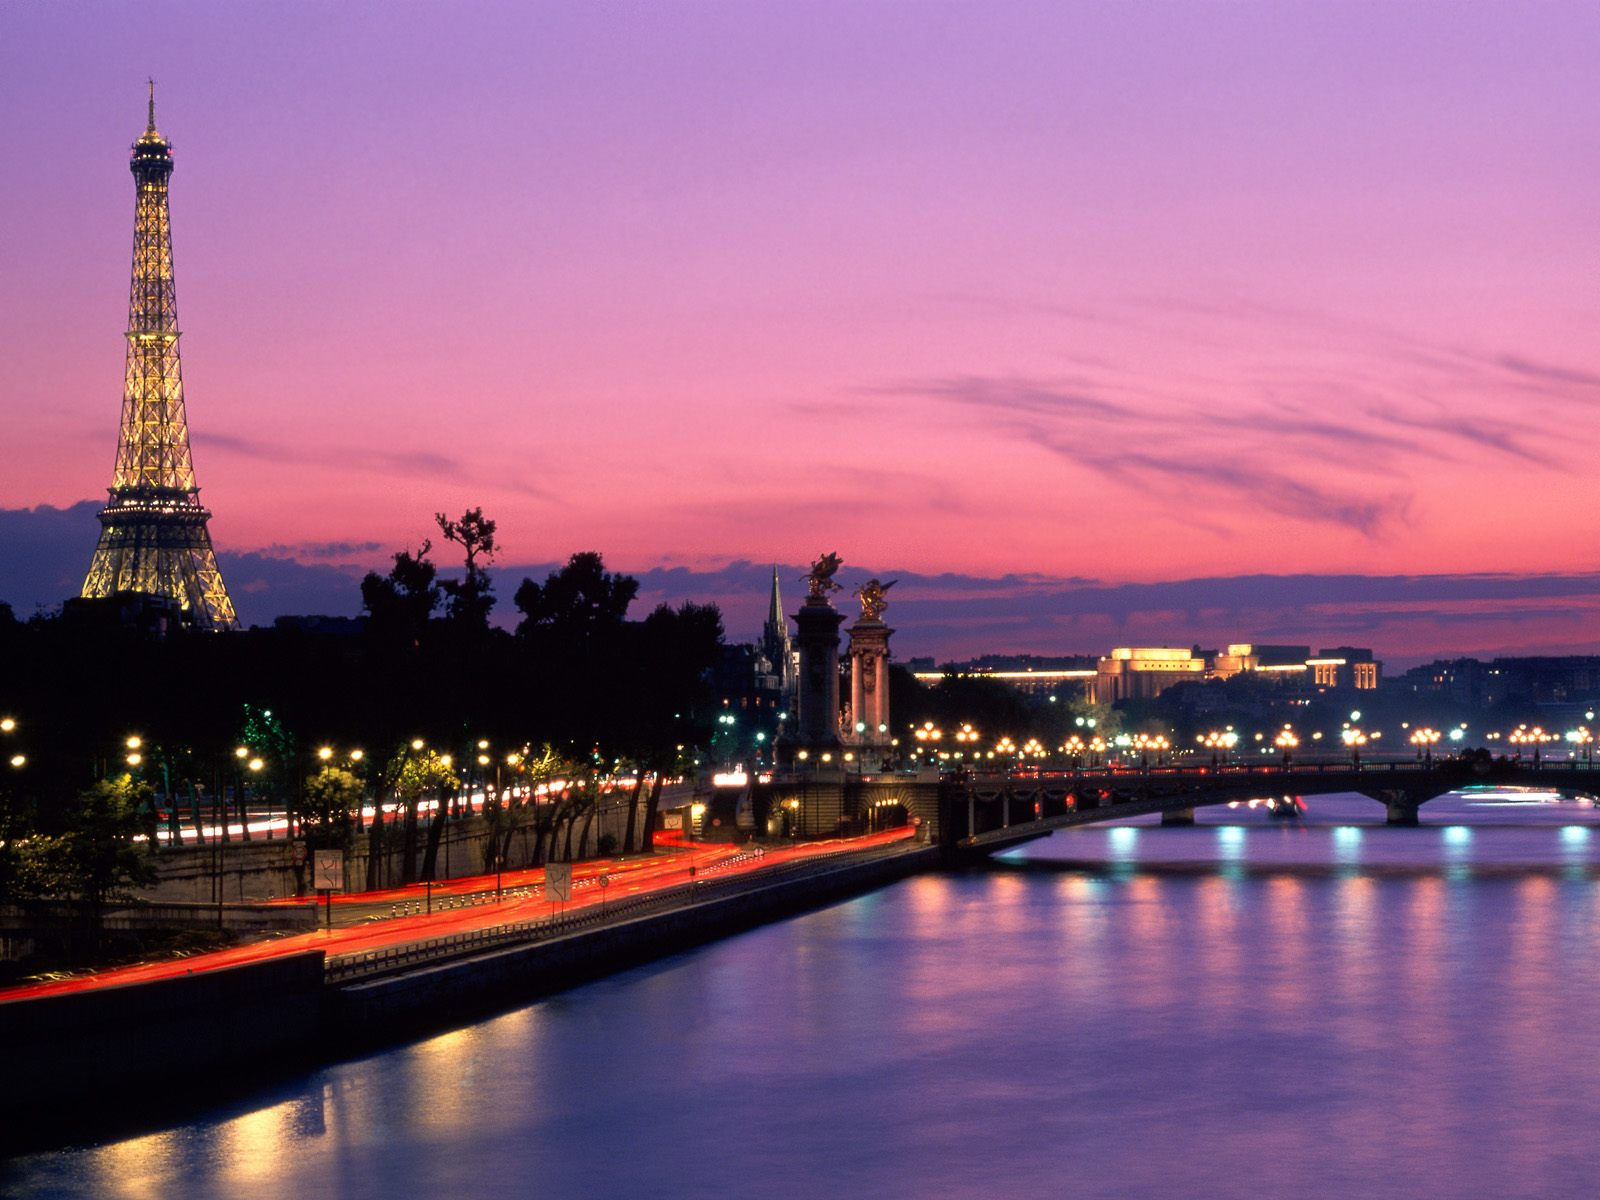 http://3.bp.blogspot.com/-ltAEztpVLPA/TpPrHMdpyvI/AAAAAAAAATI/cLIbpmq41oA/s1600/Paris.jpg